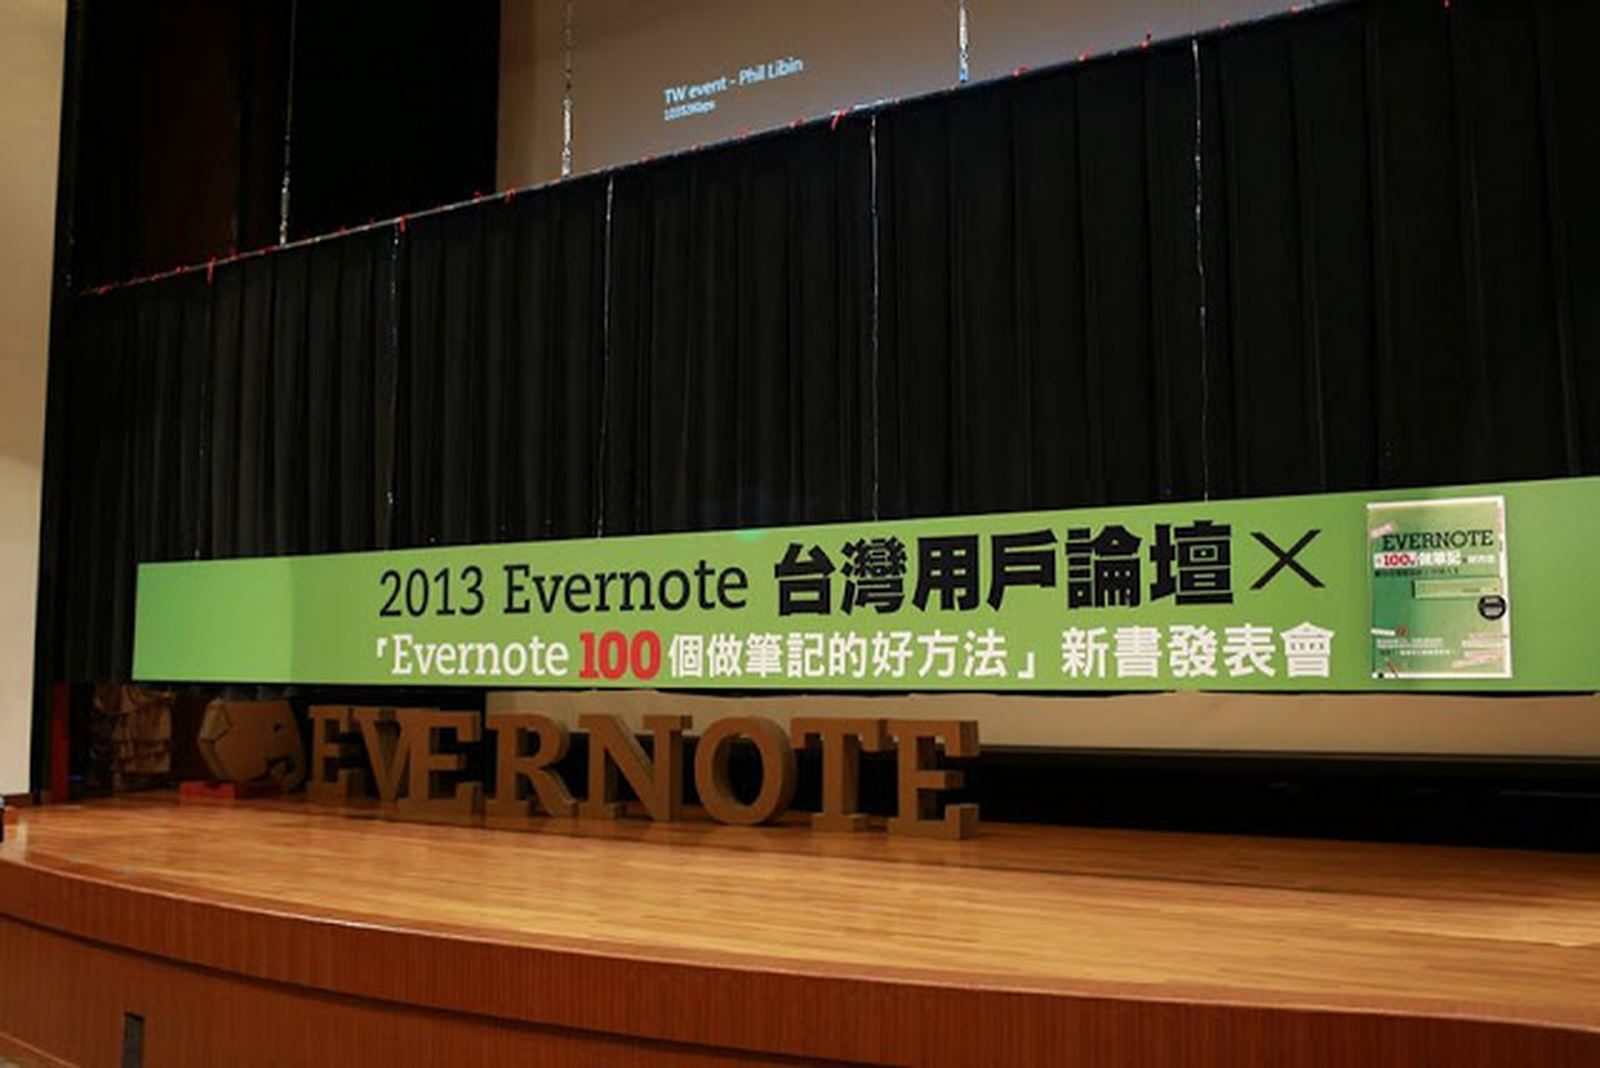 2013 Evernote 台灣用戶論壇 X 「Evernote 100個做筆記的好方法」新書分享會